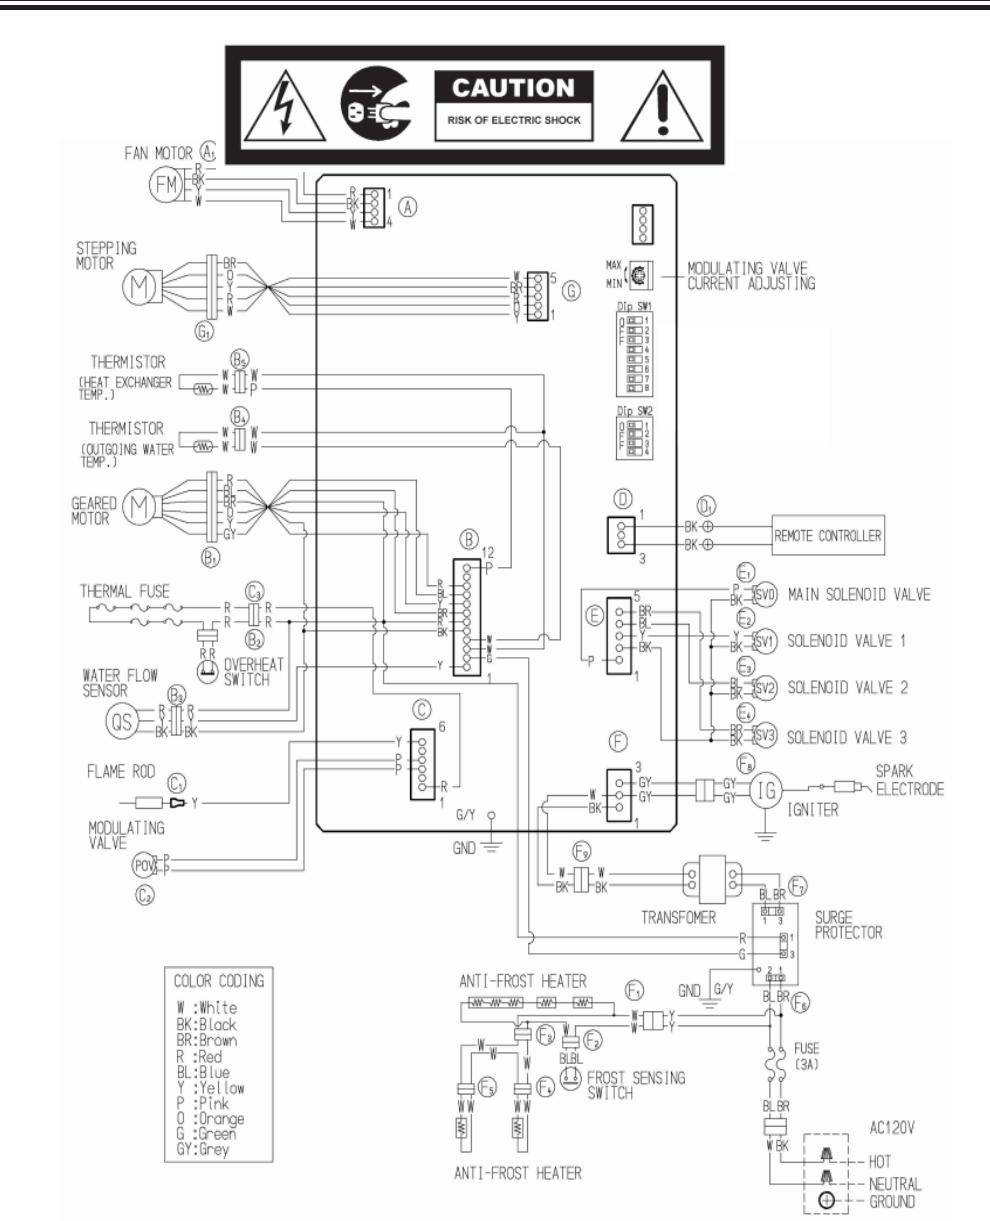 REU 2532 W Service Manual 08 03.pmd Rinnai